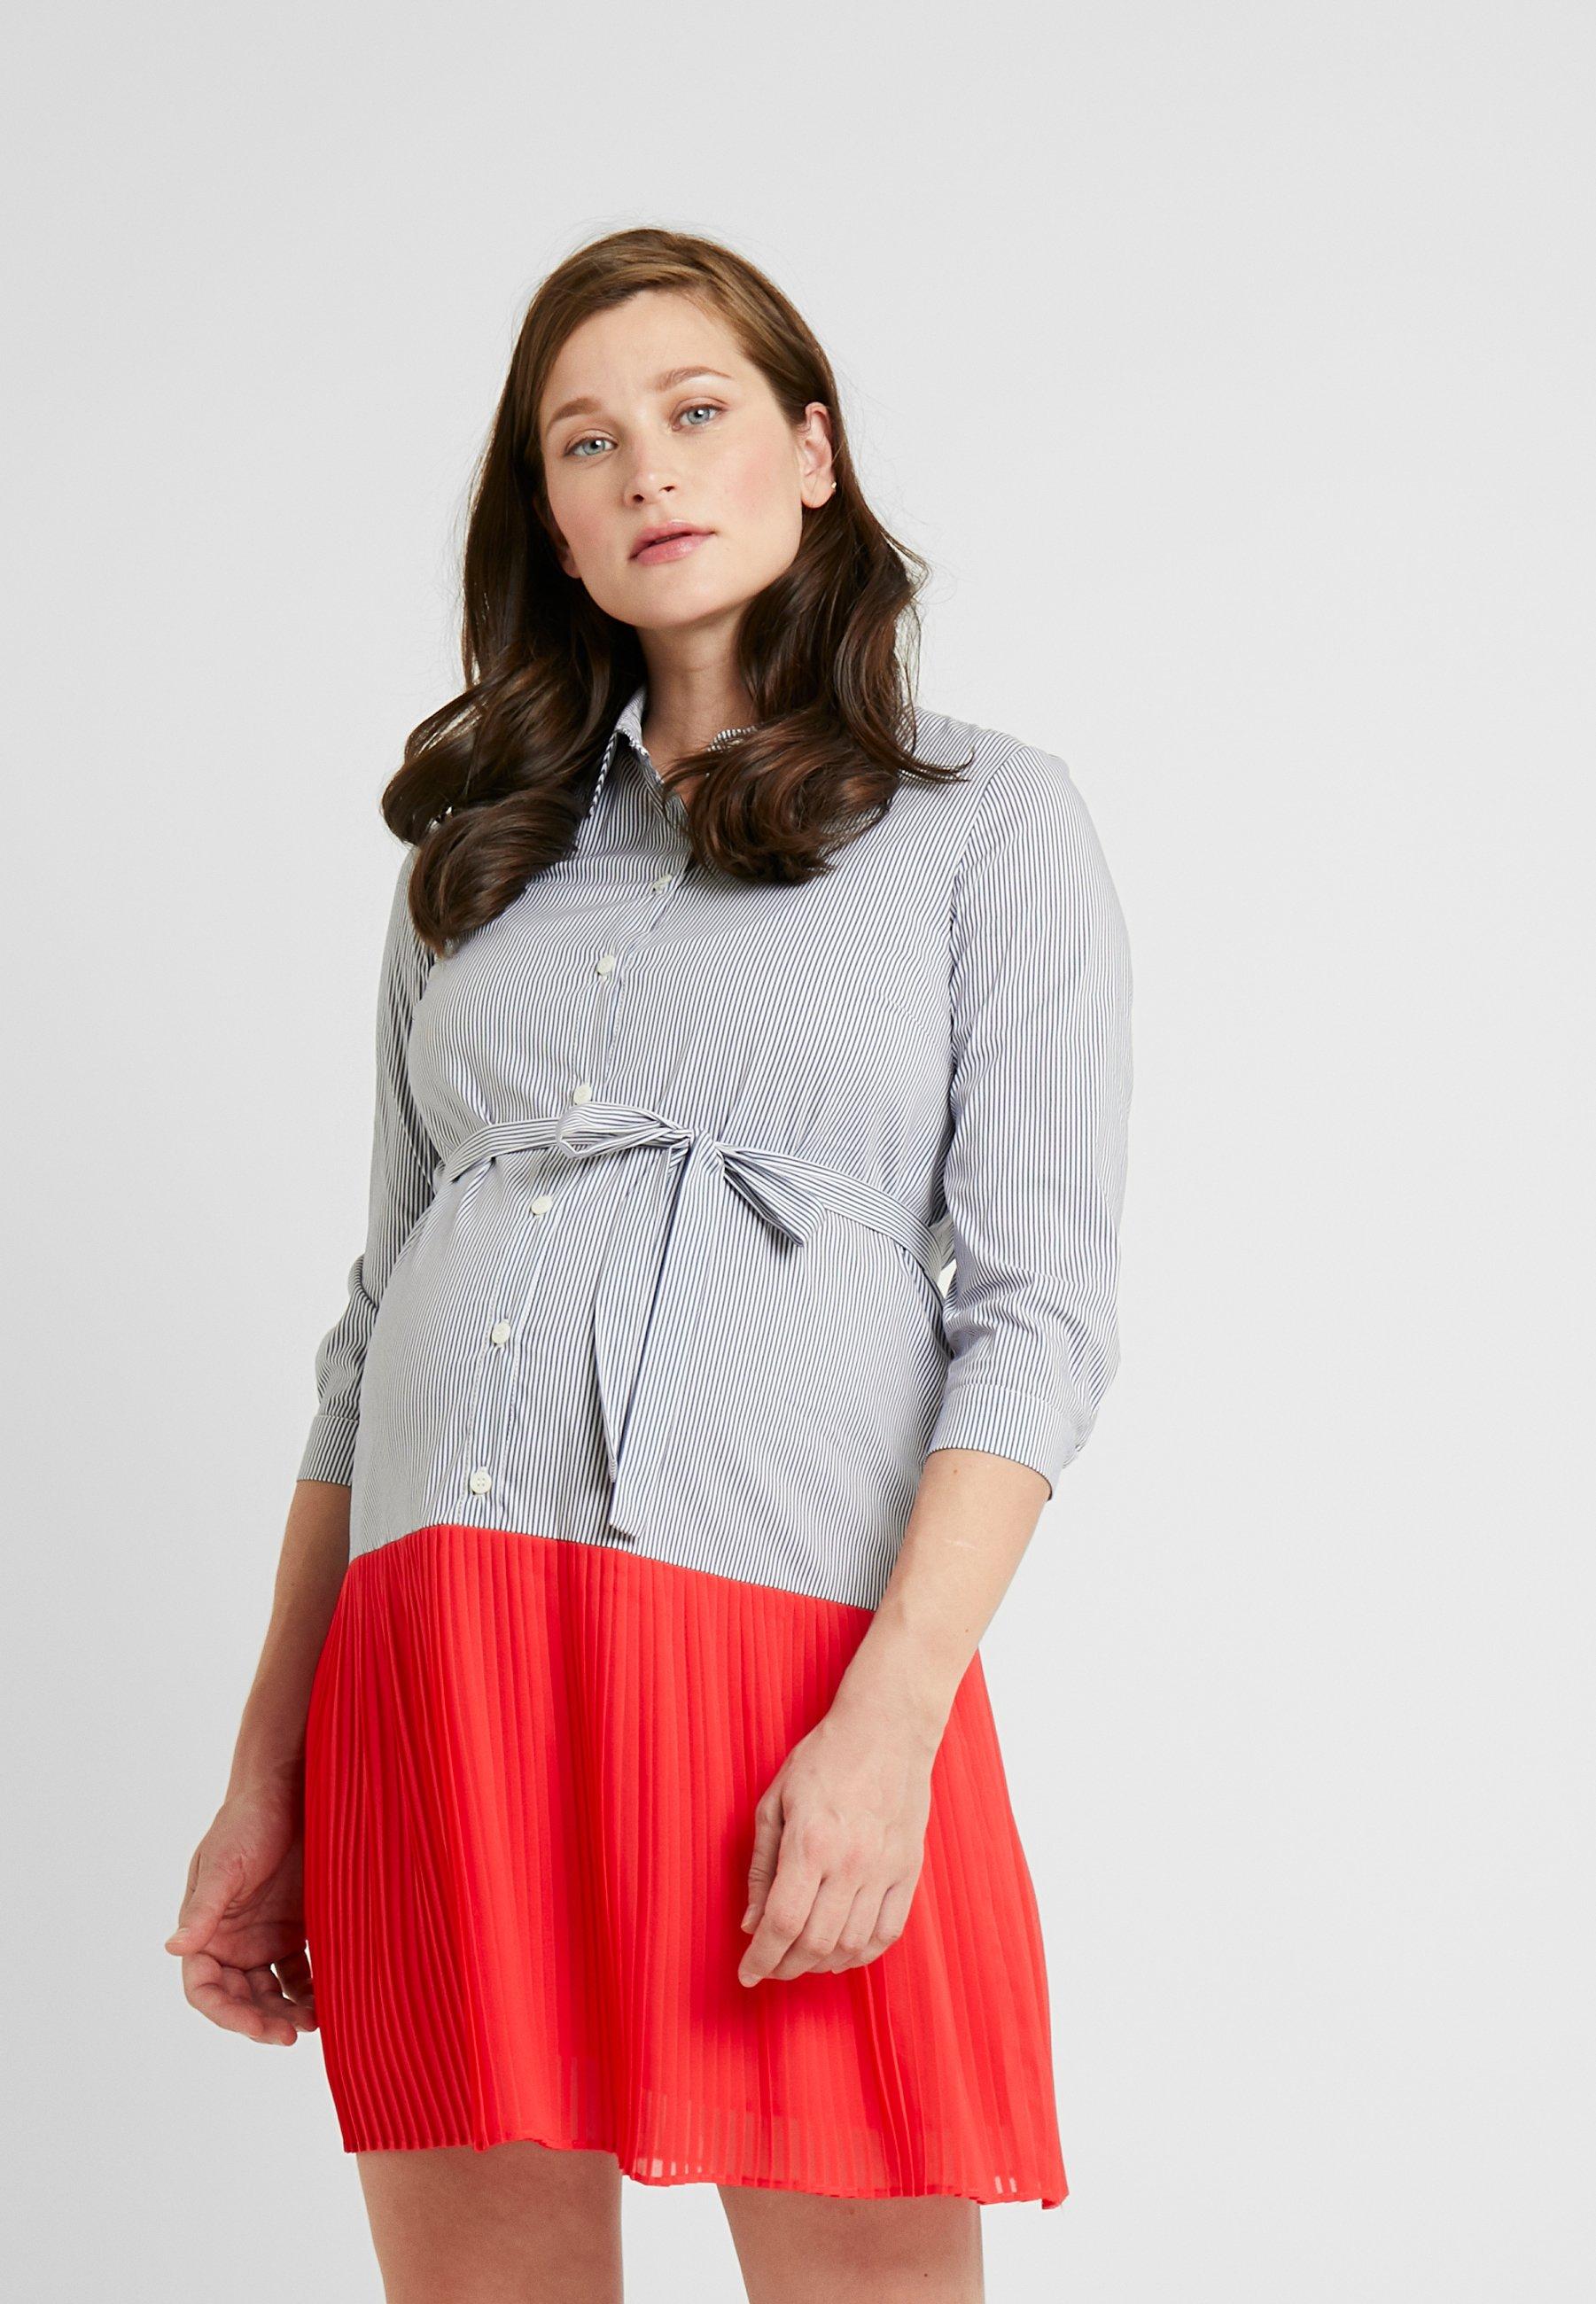 ATTESA CAMICIA PLISSE - Blusenkleid - coral | Damenbekleidung 2020